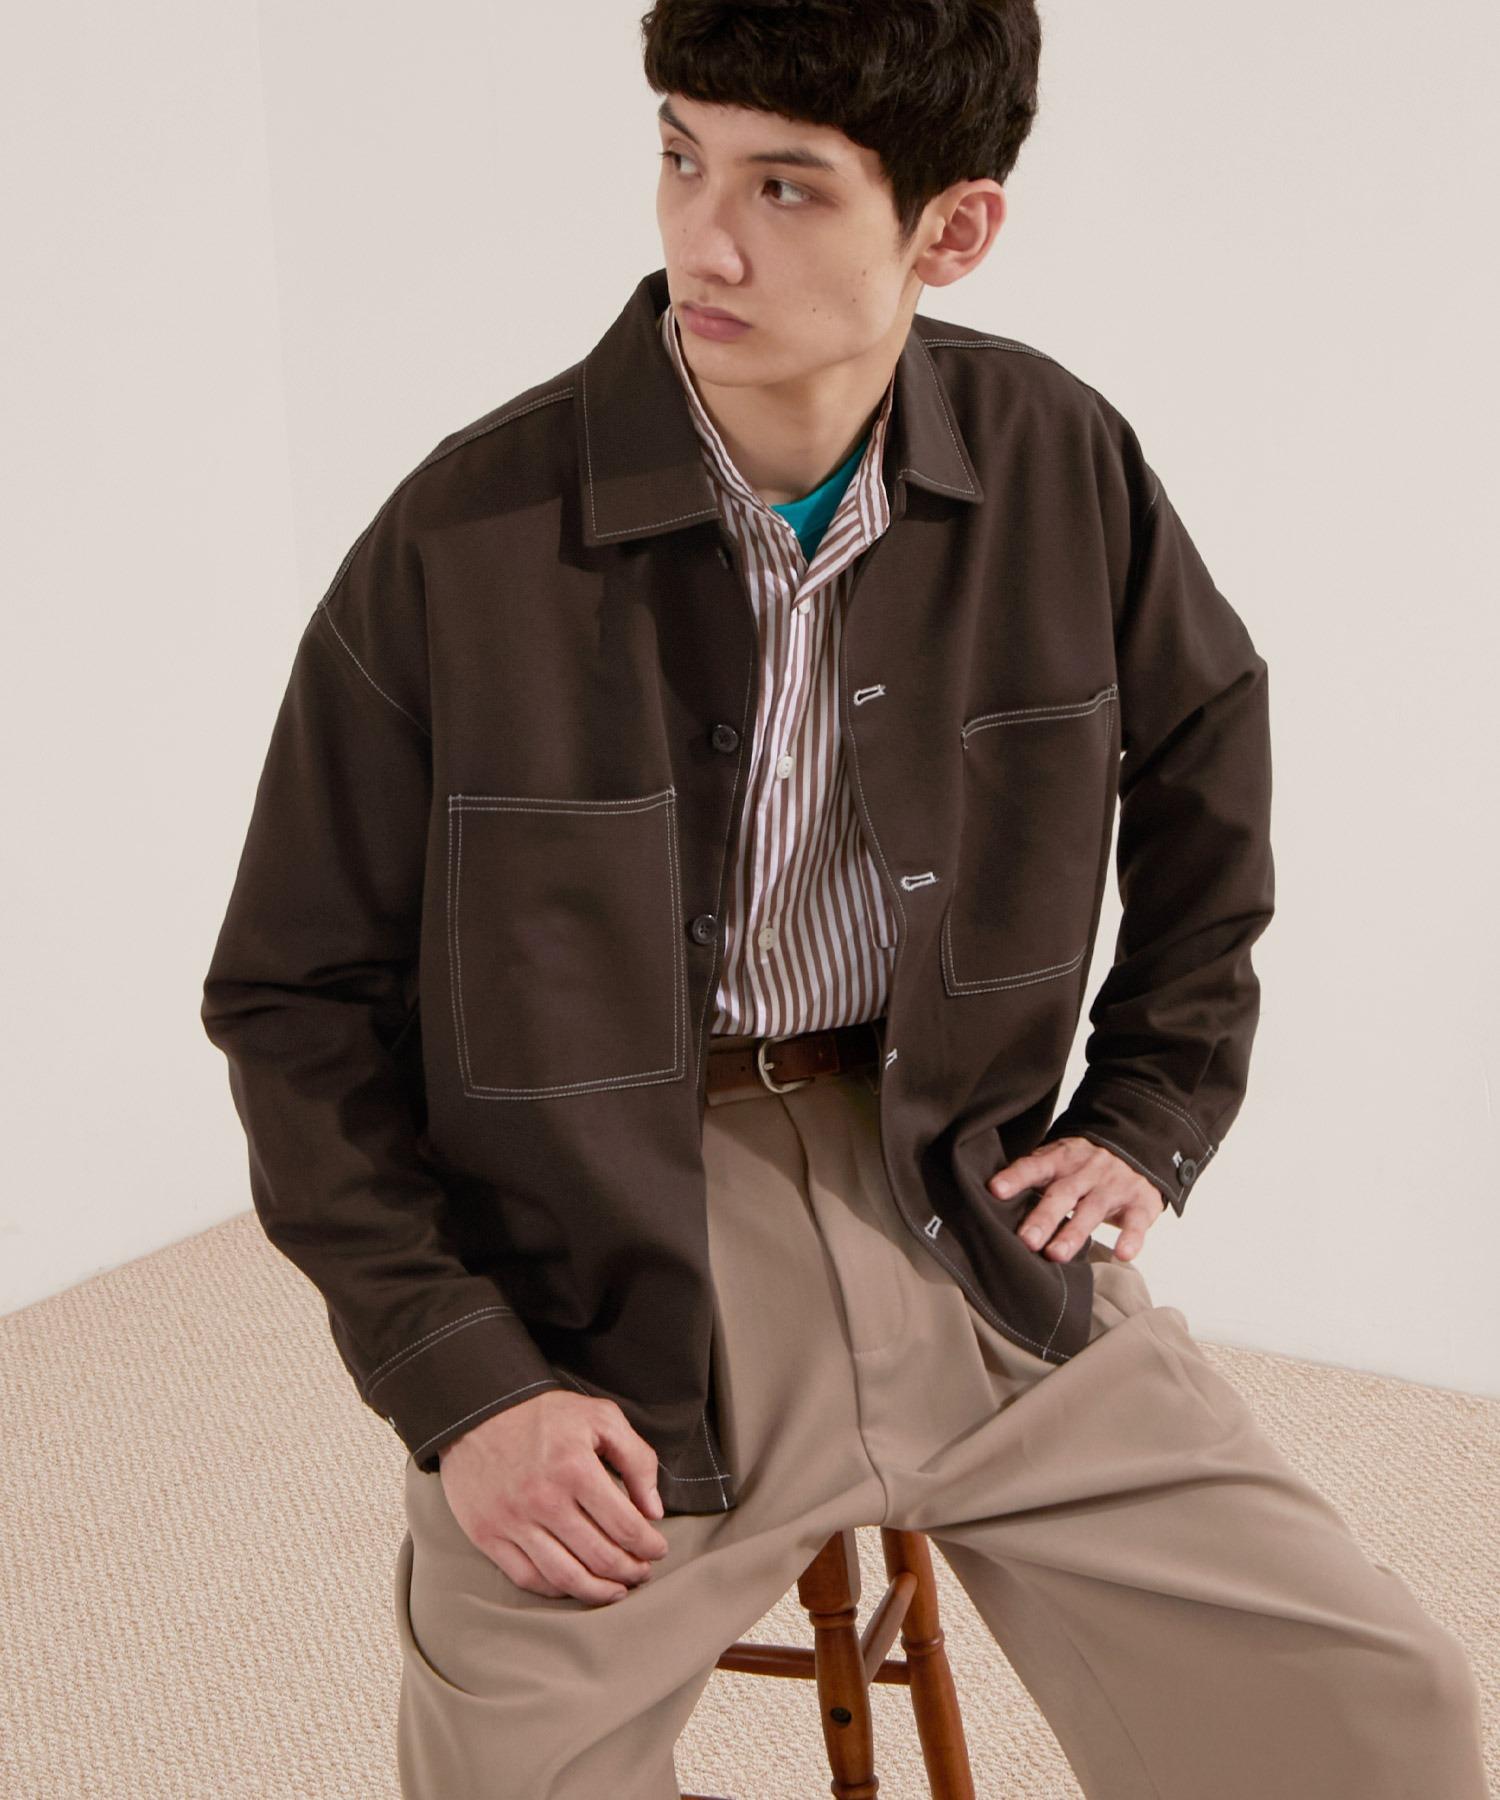 TRストレッチ ビッグステッチ L/Sオーバーボックス CPOシャツジャケット カバーオールシャツ EMMA CLOTHES 2021 S/S